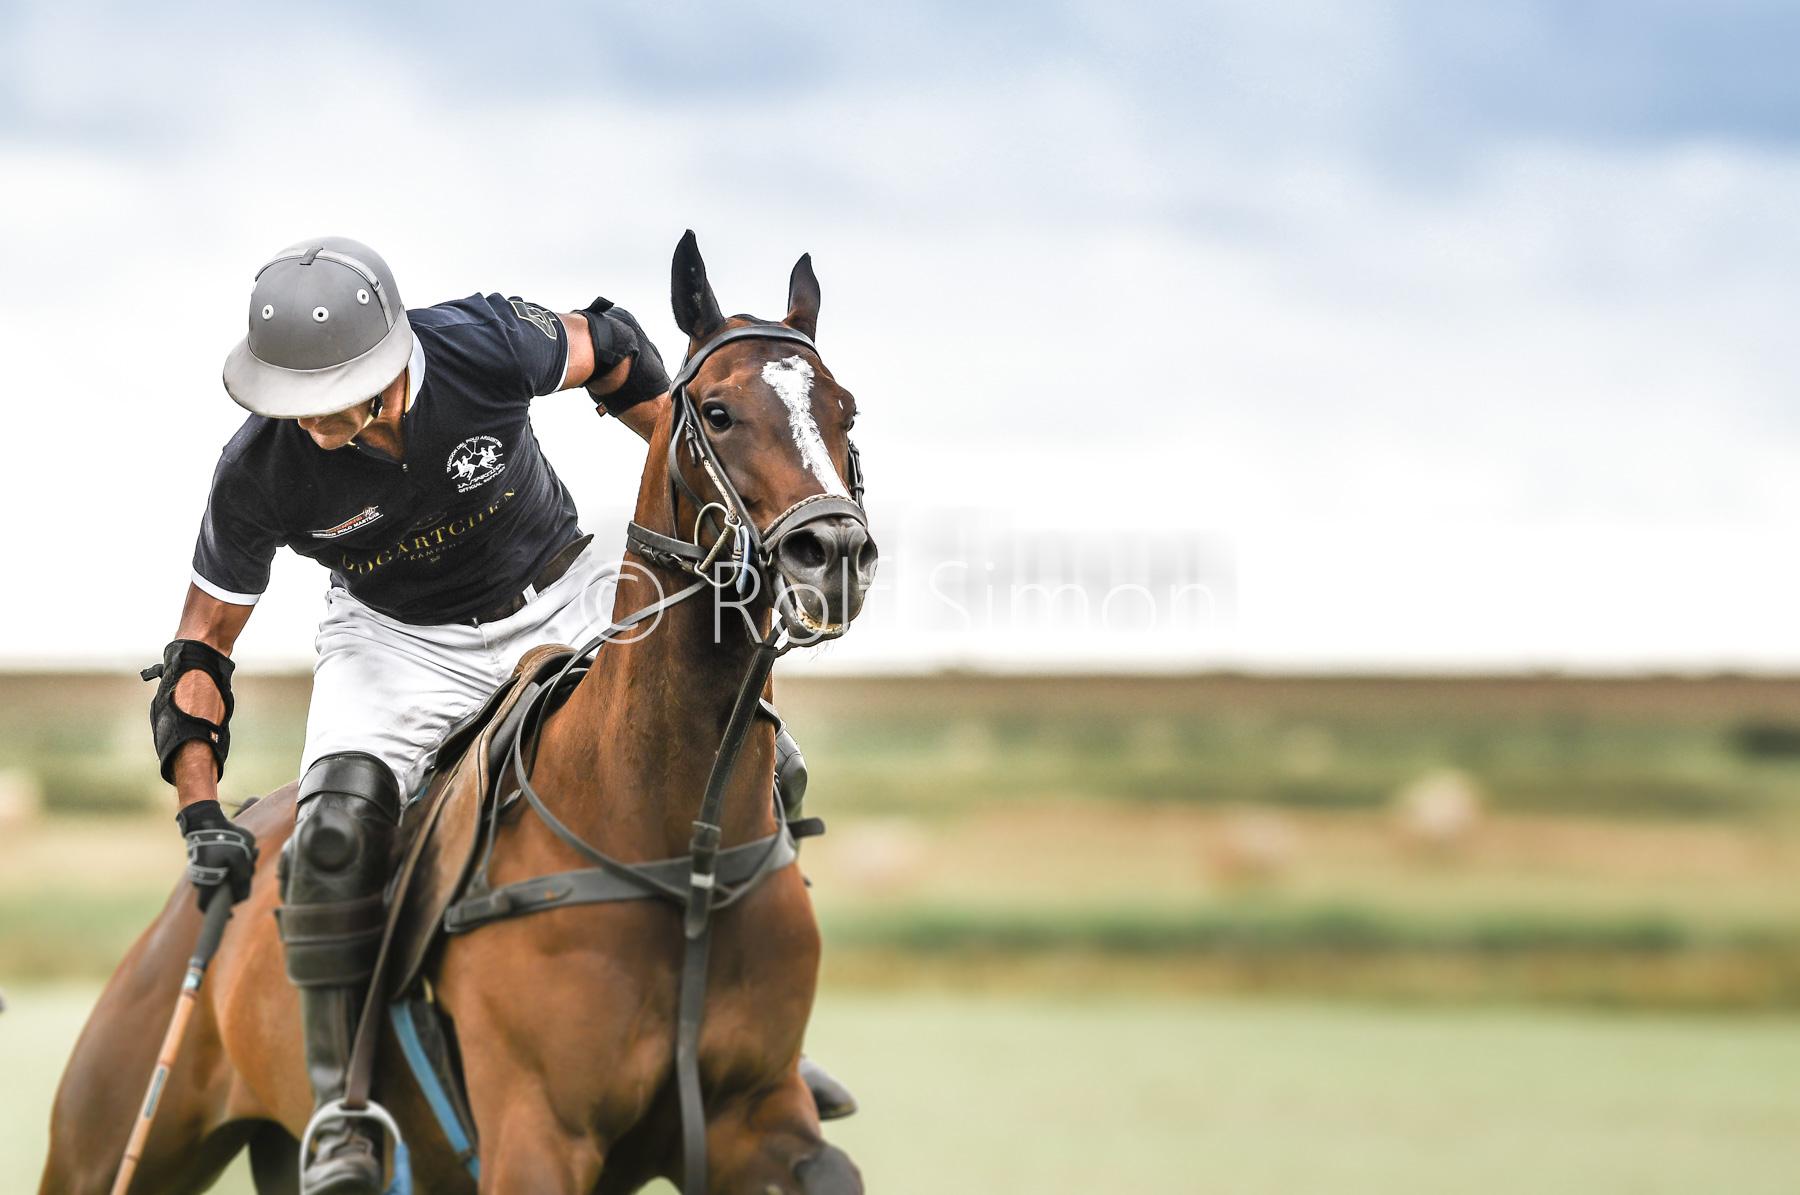 20.Berenberg German Polo Masters 2018 0004 1